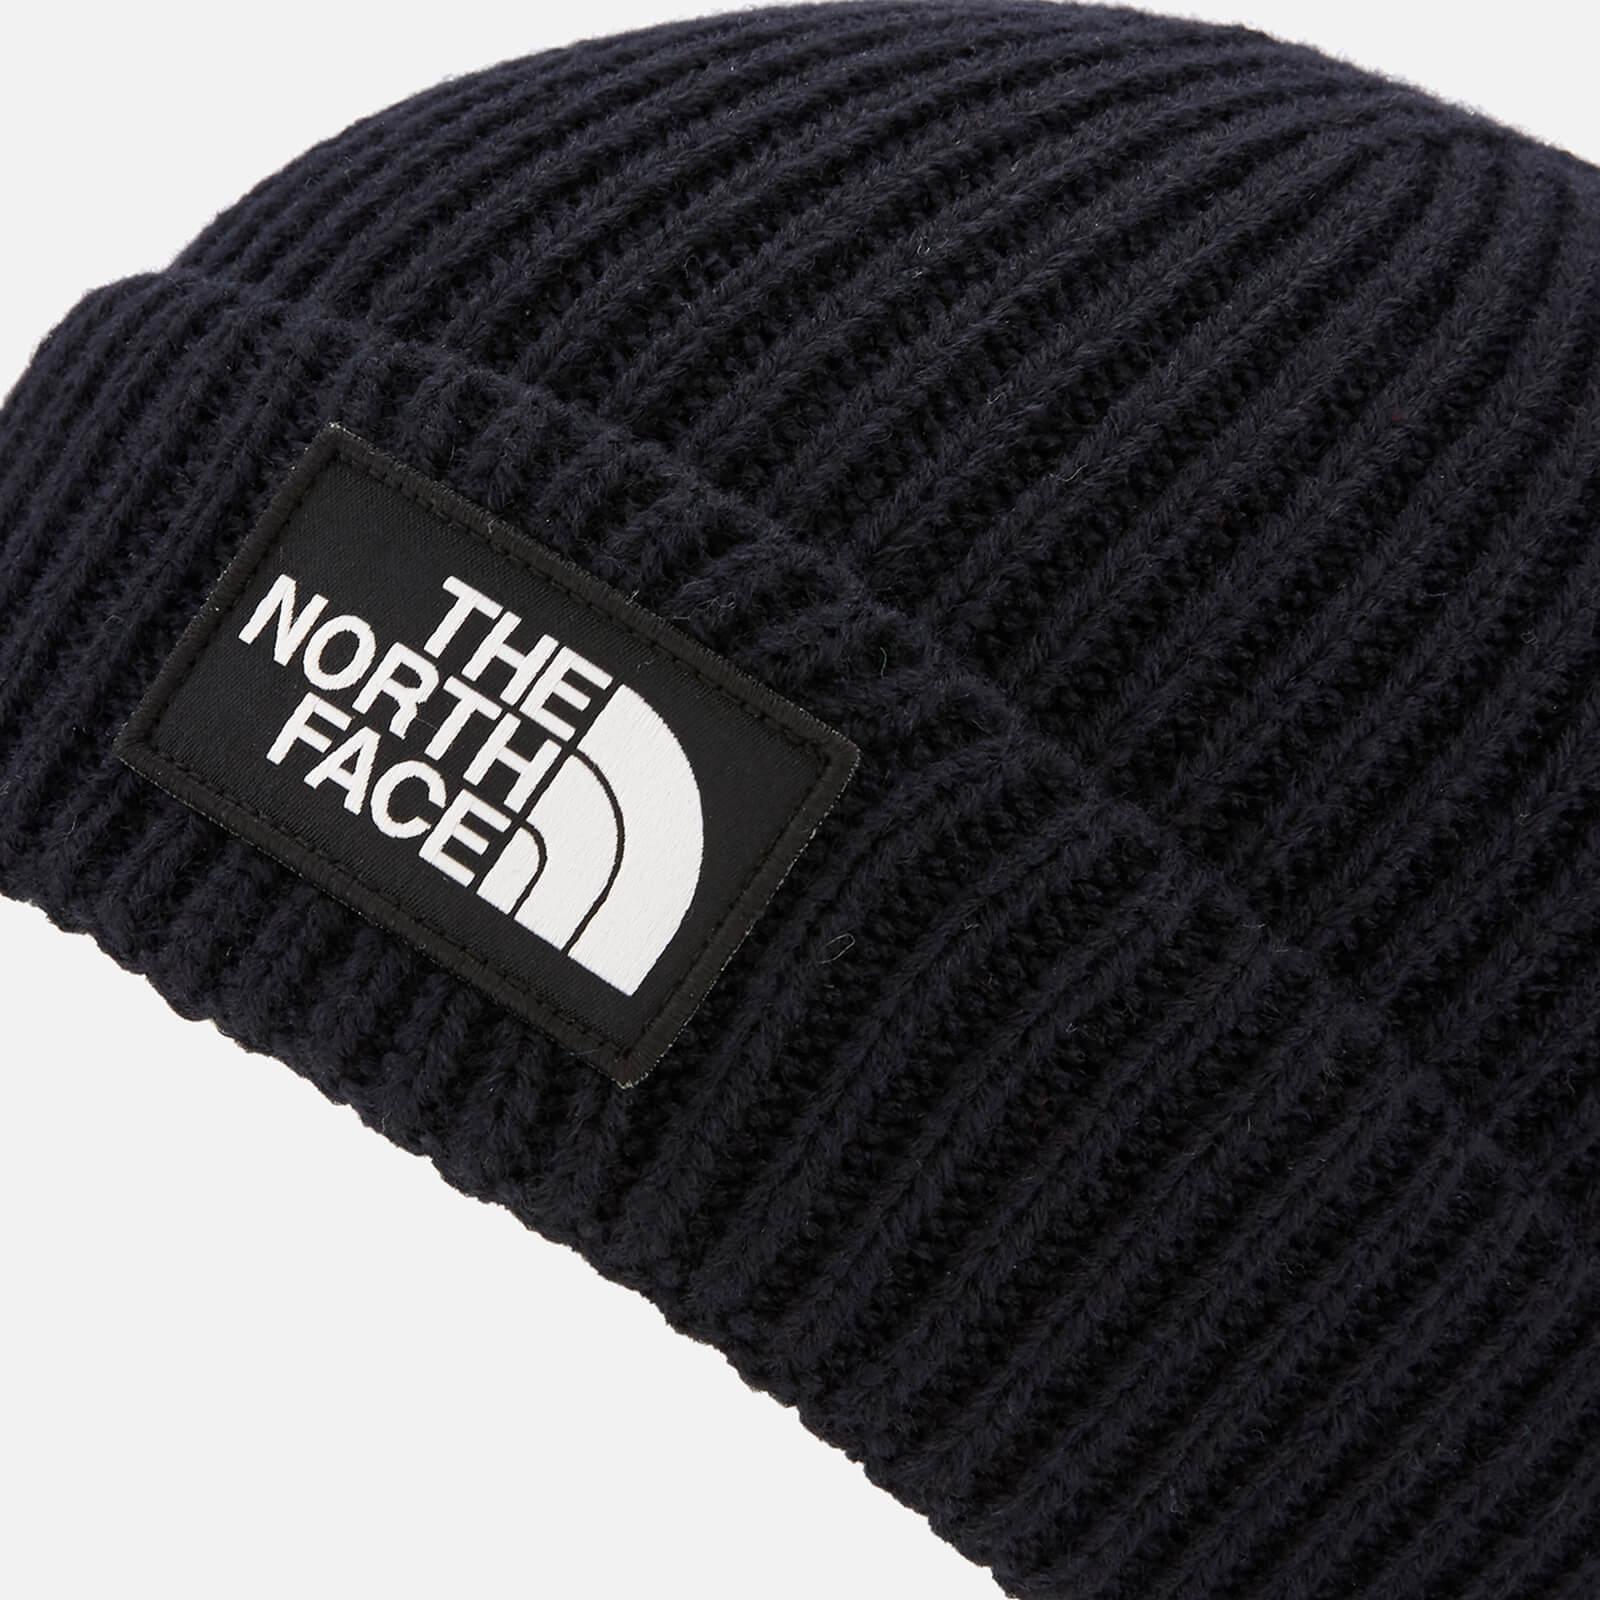 2a54d3cd83b Lyst - The North Face Tnf Logo Box Cuffed Beanie In Black in Black ...